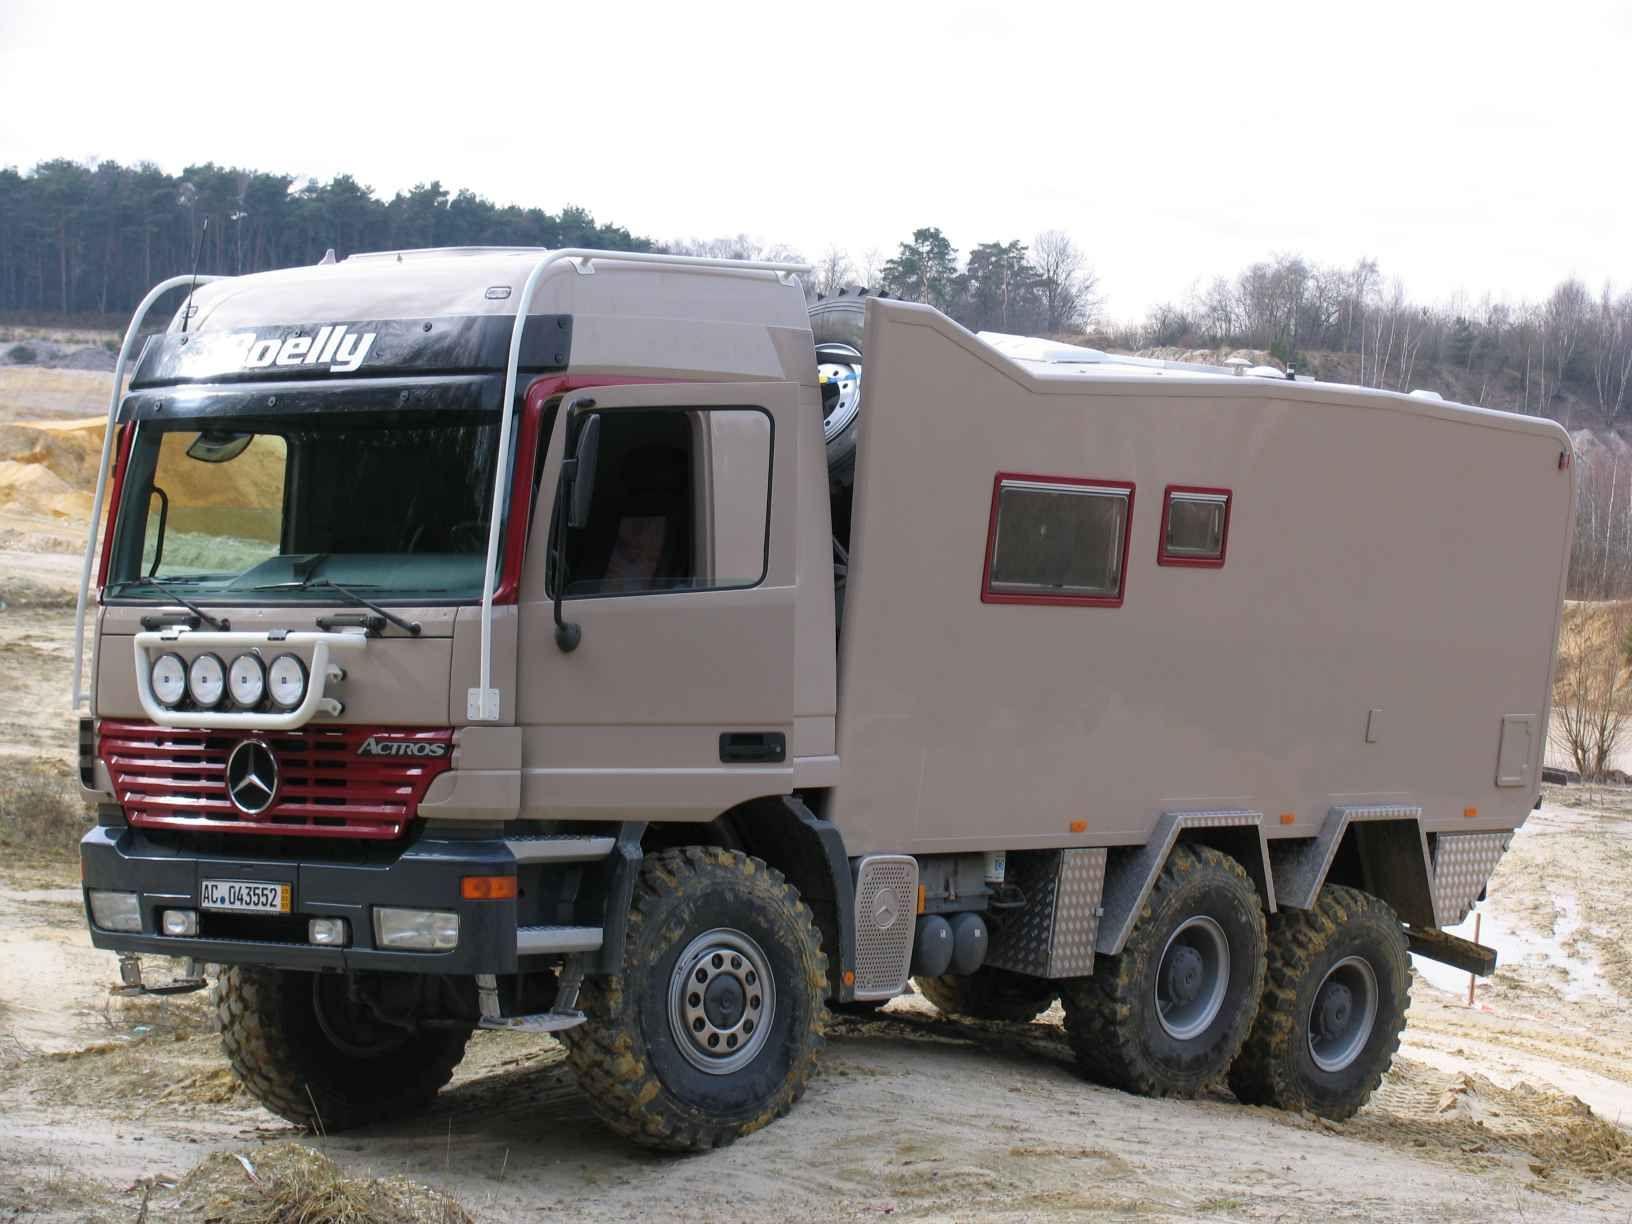 rv unimog | dutchman paul aalmans knows his off road campers